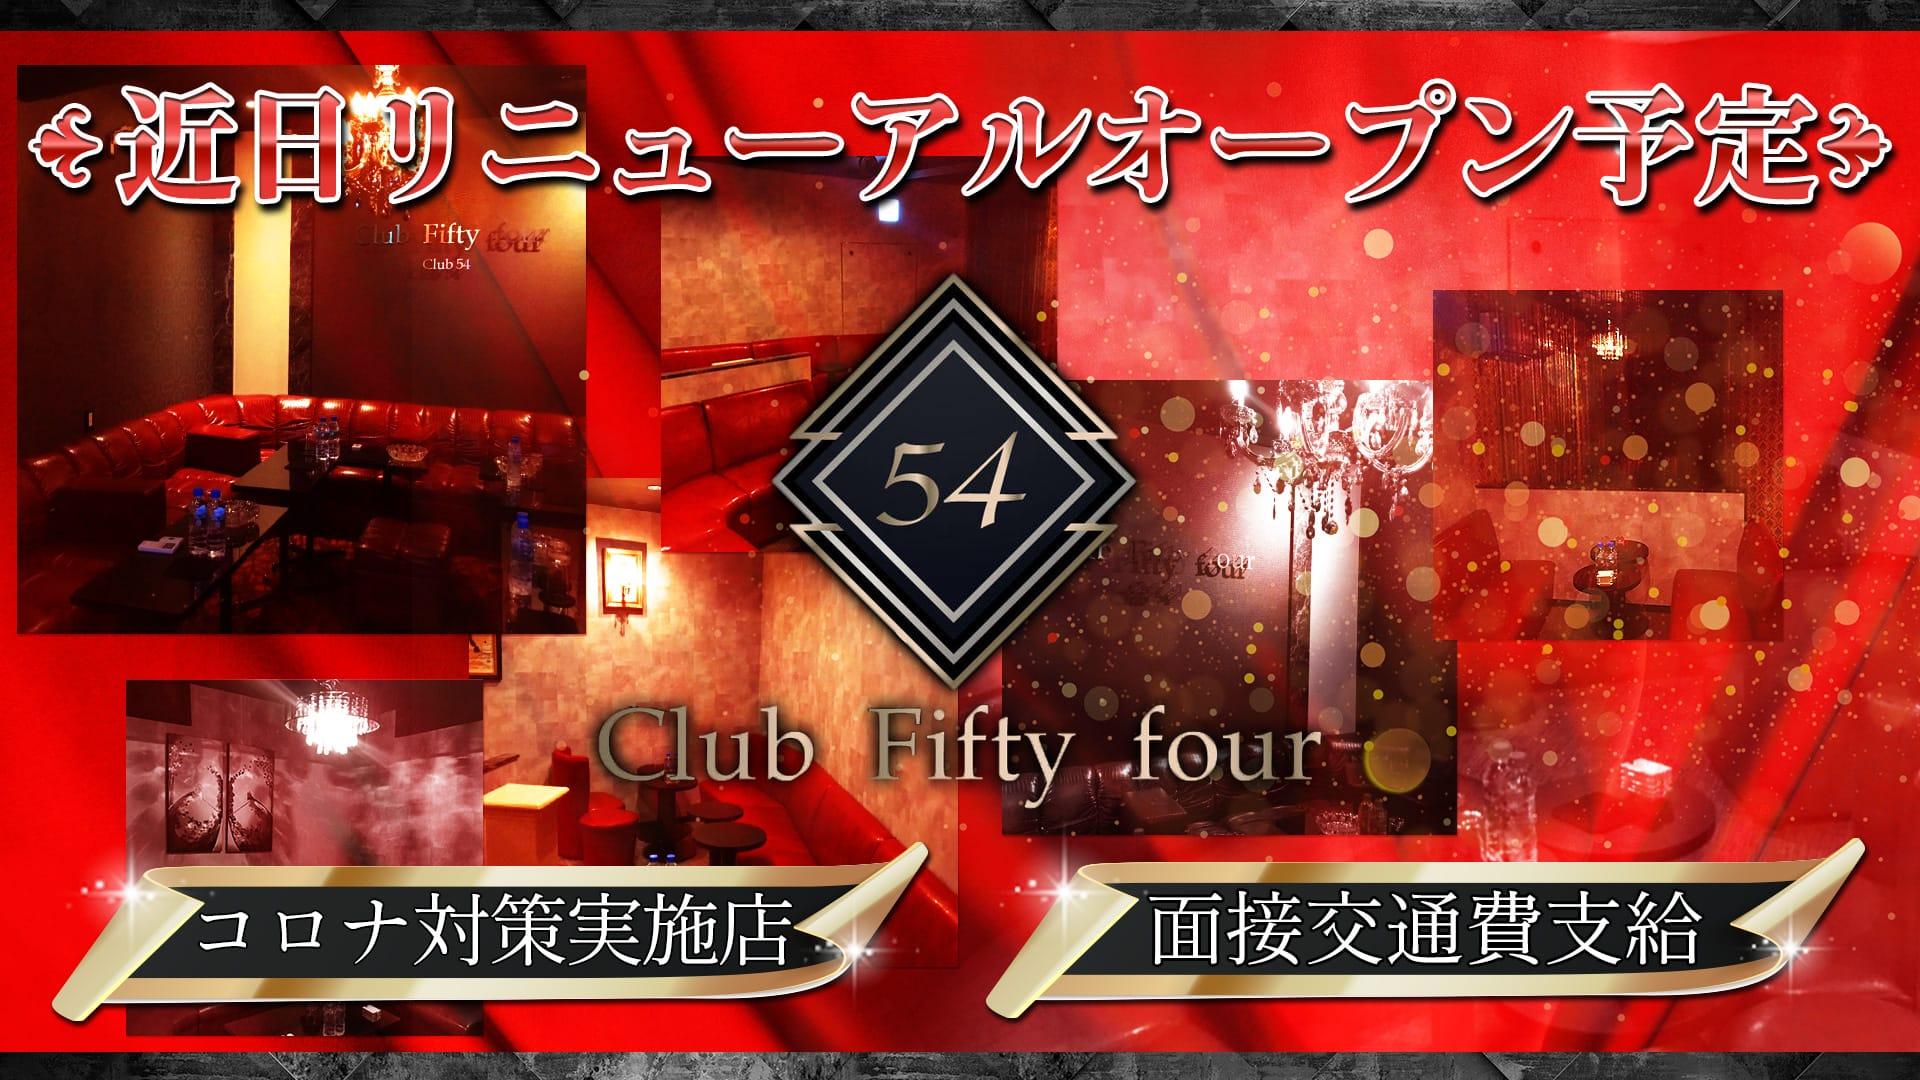 Club 54(クラブ フィフティーフォー) 千葉キャバクラ TOP画像